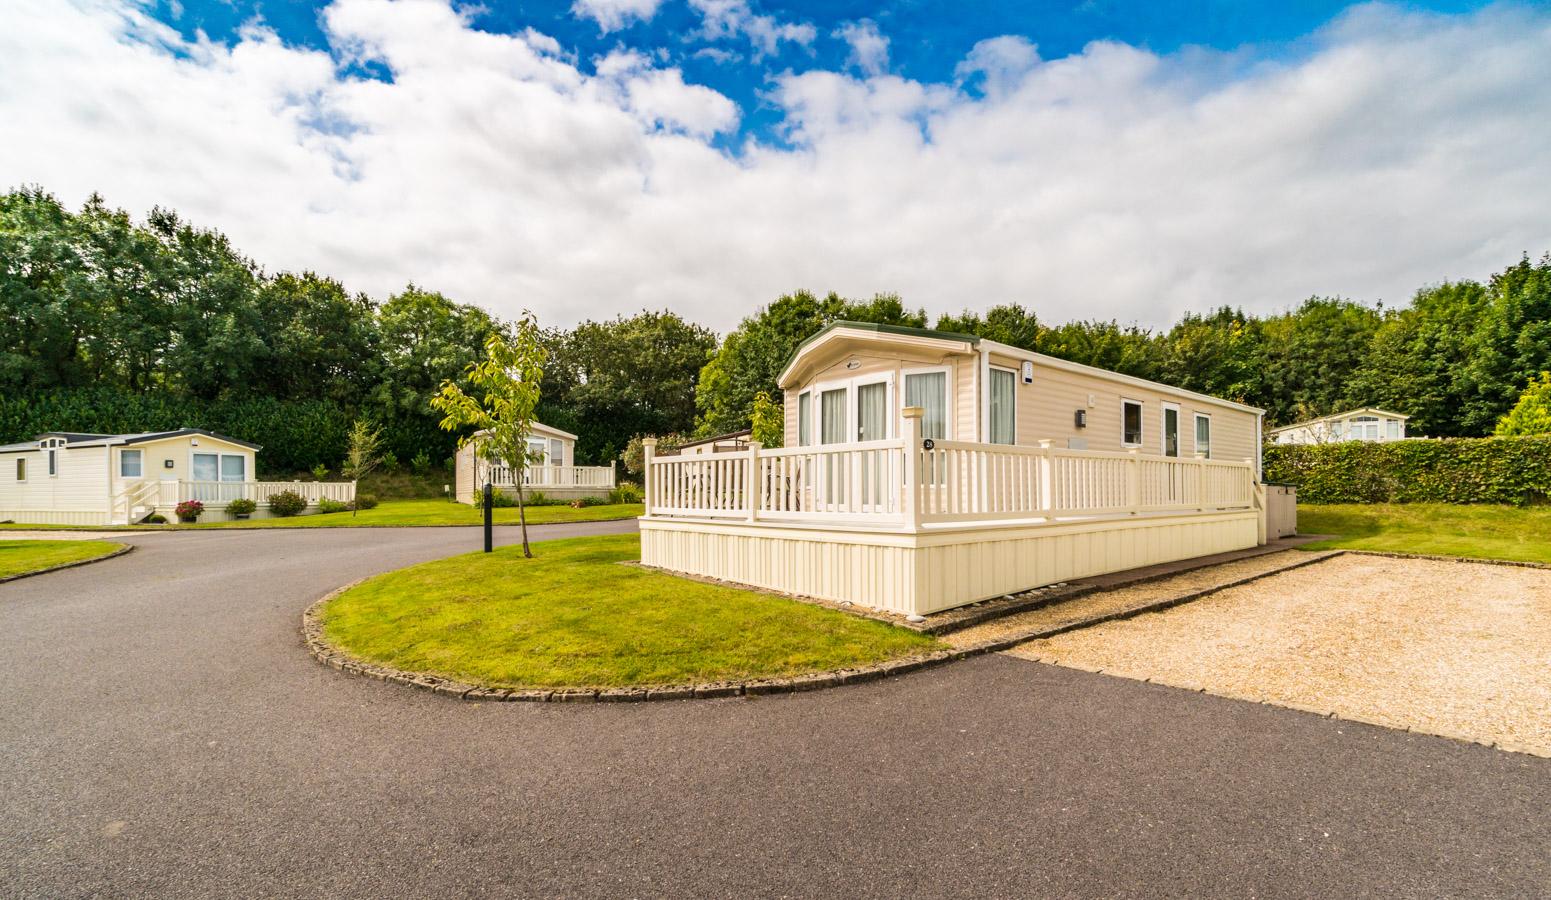 Neil-Bigwood-Monkton-Wyld-Holiday-Homes-39